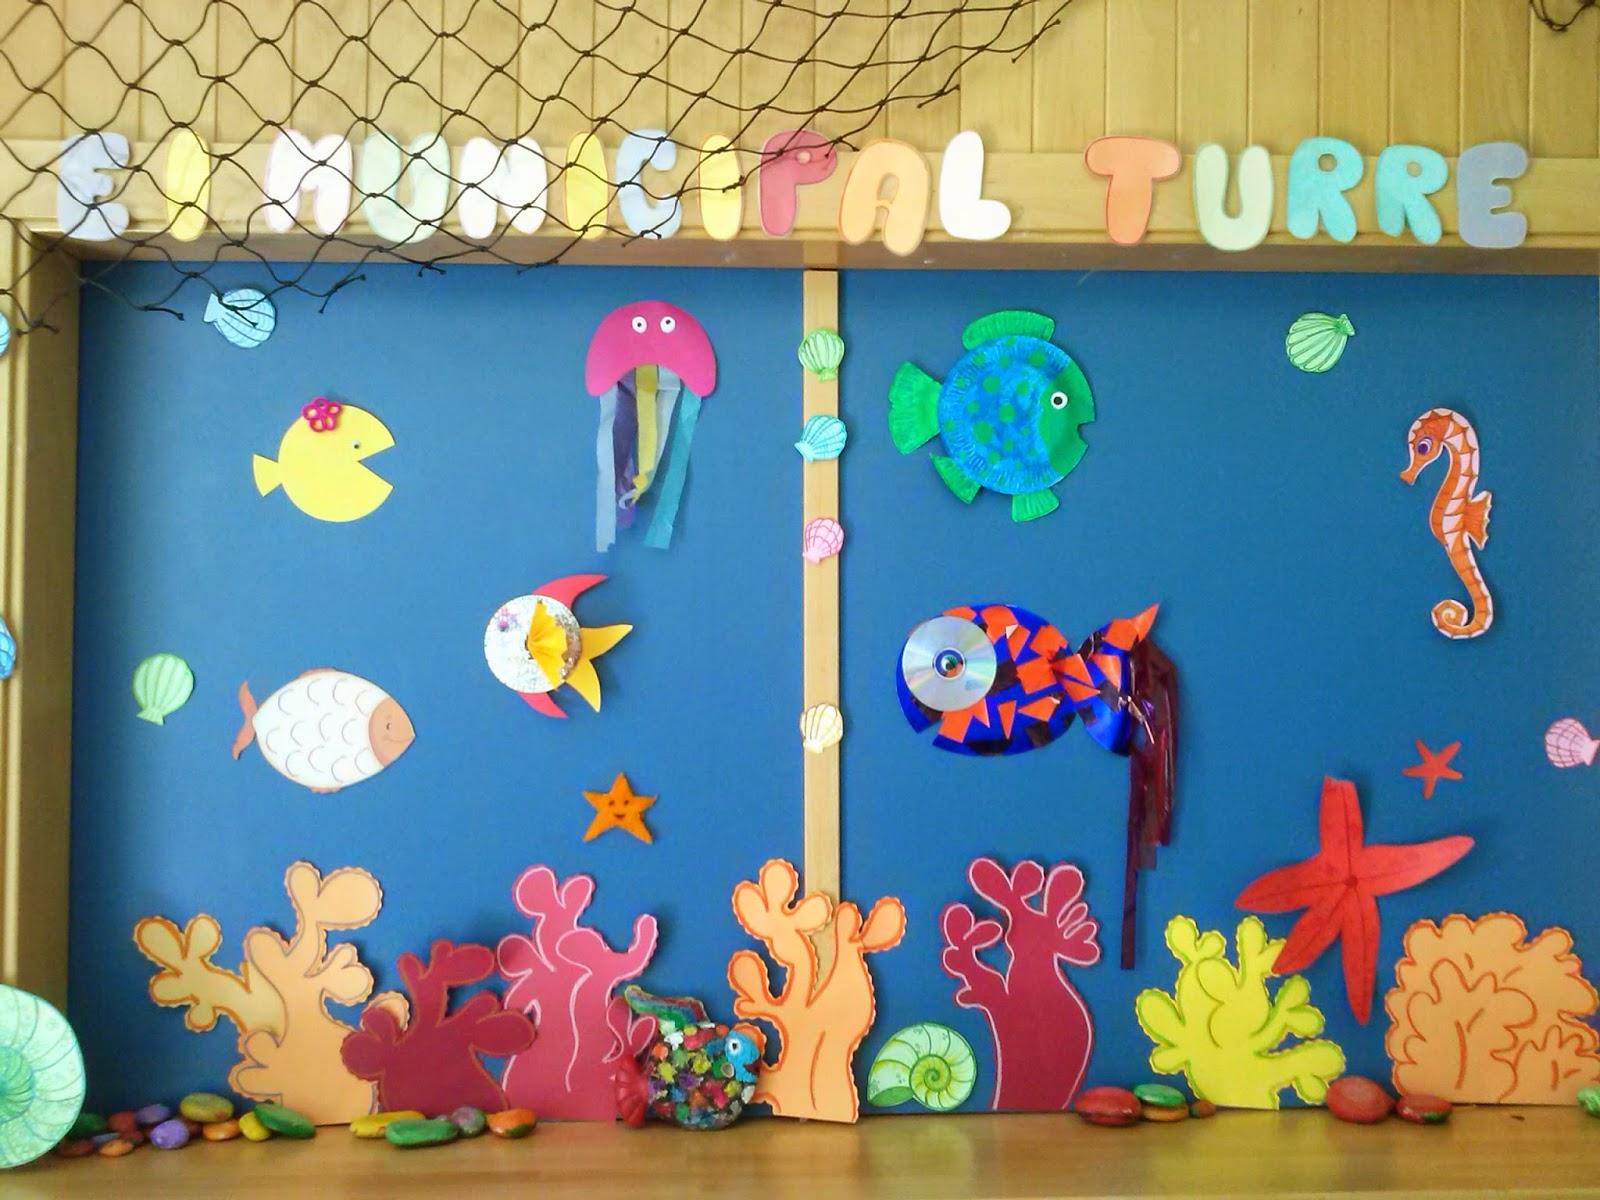 Escuela infantil turre julio 2014 for Decoracion verano para jardin infantil